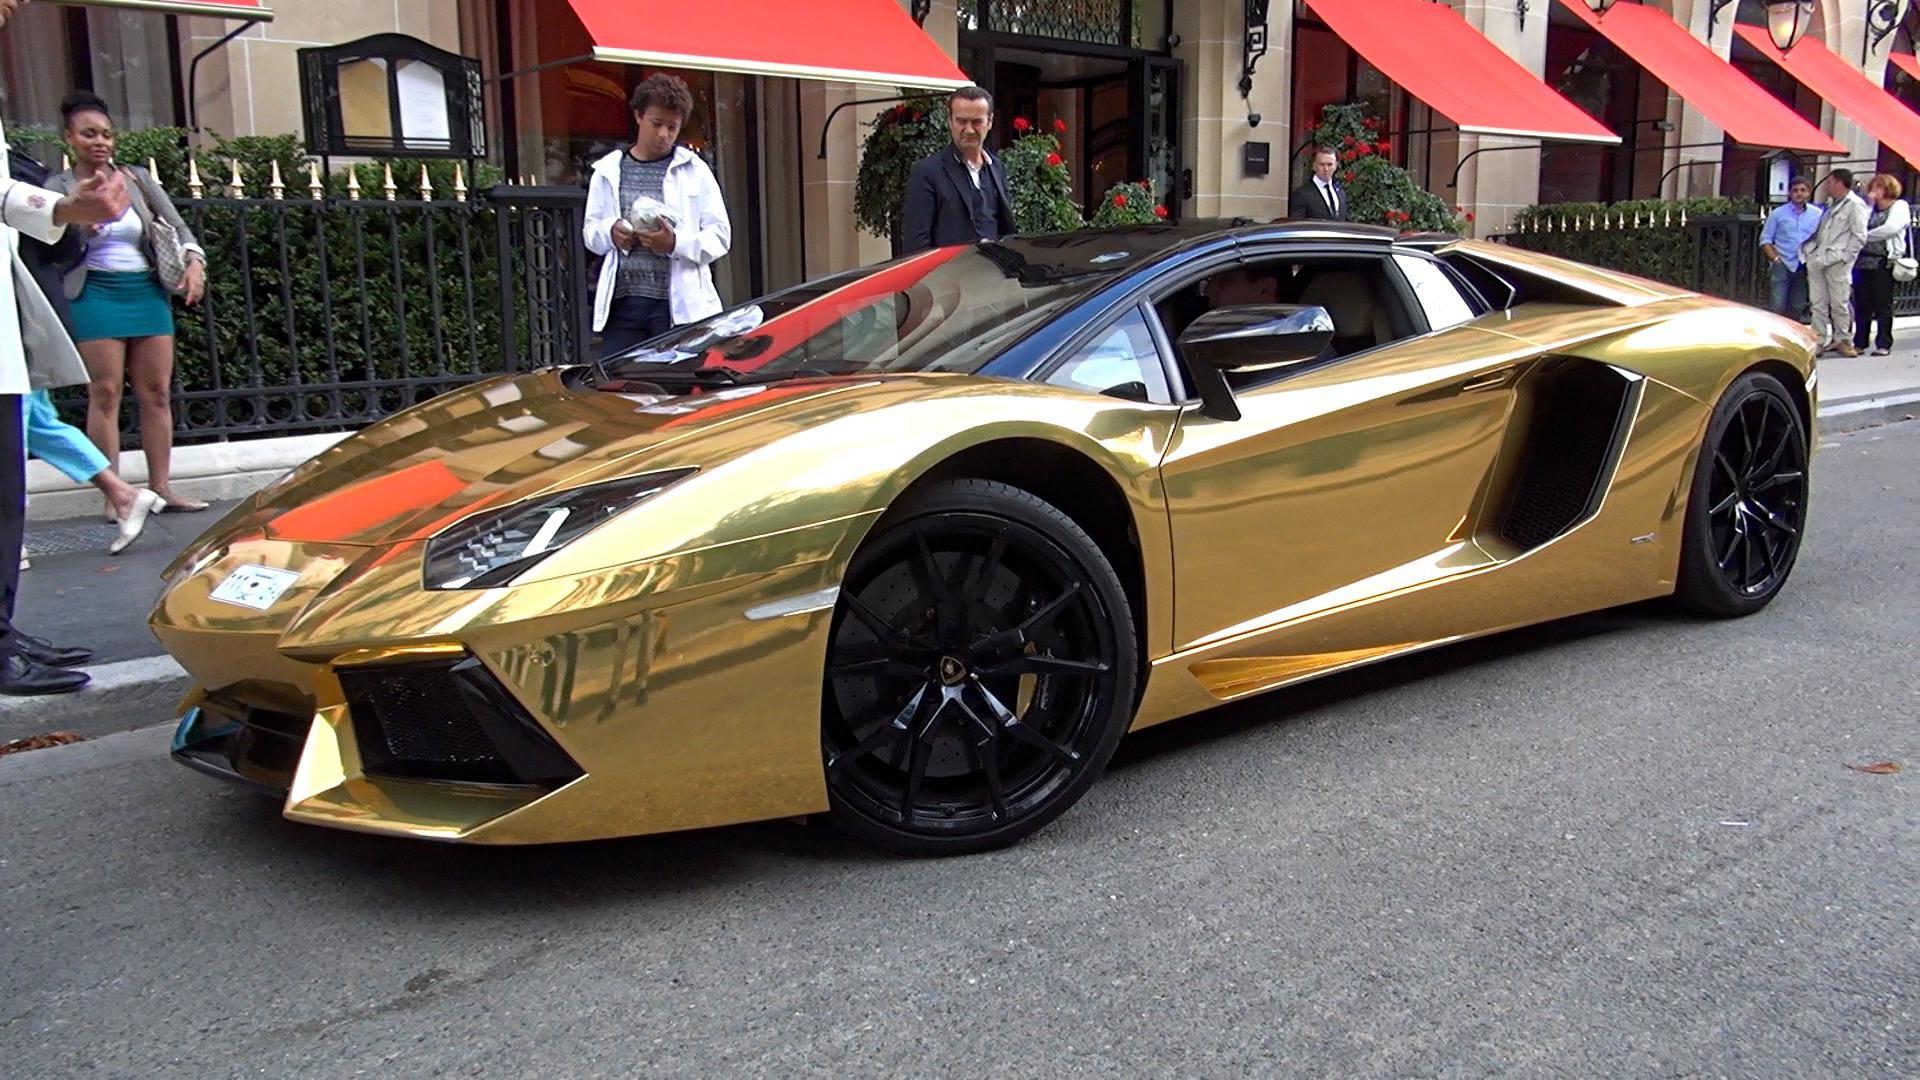 New   Vinemoments Gold Lamborghini Aventador Convertible on gold ford mustang convertible, gold bmw convertible, gold lamborghini veneno roadster, gold corvette convertible, gold audi convertible, gold ferrari convertible,